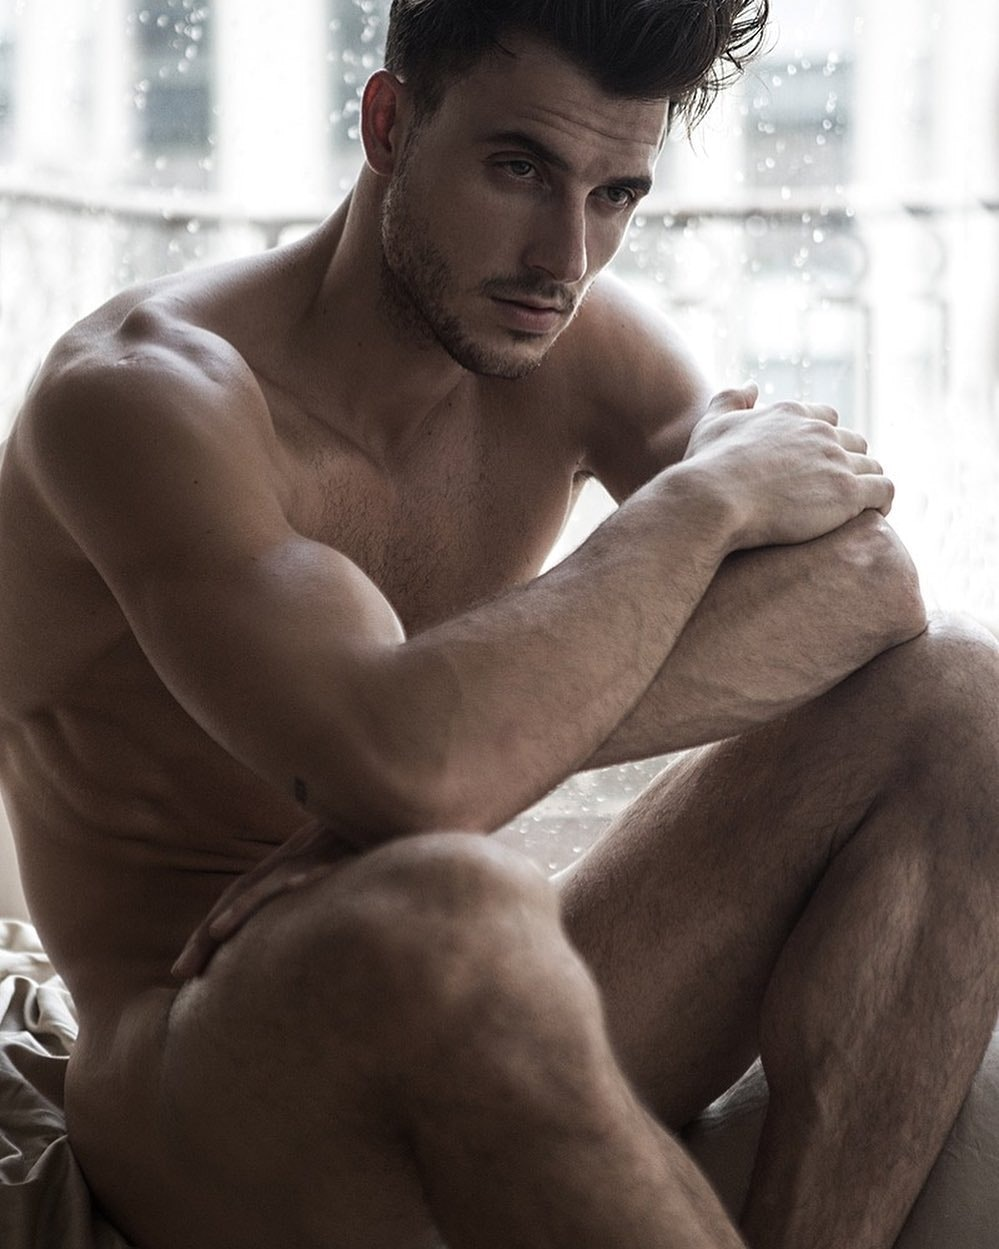 #men #hunks #muscle #hotmen #hotboys #shirtlessguys